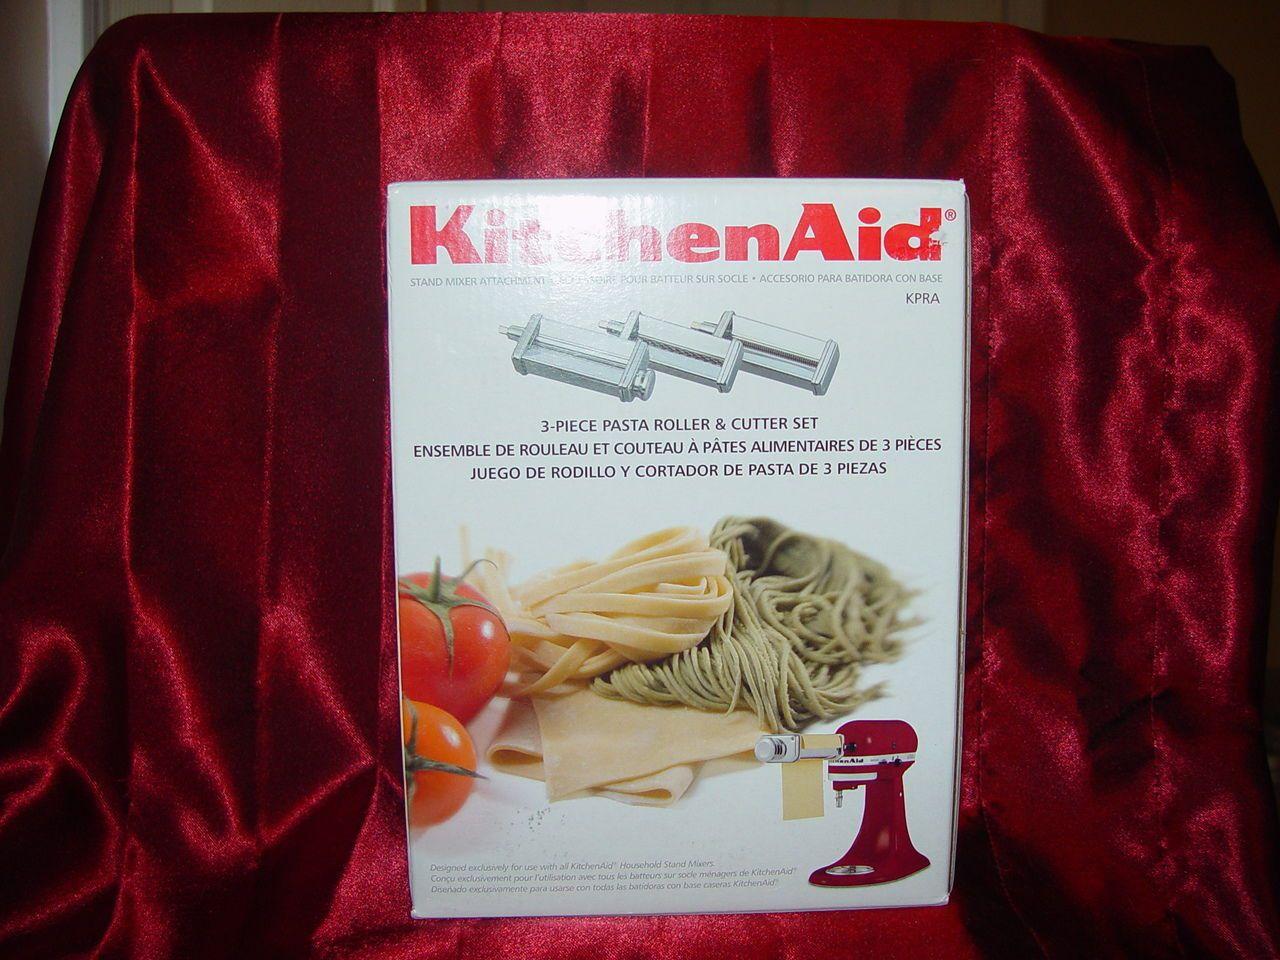 Kitchenaid 3 piece pasta roller photo - 2